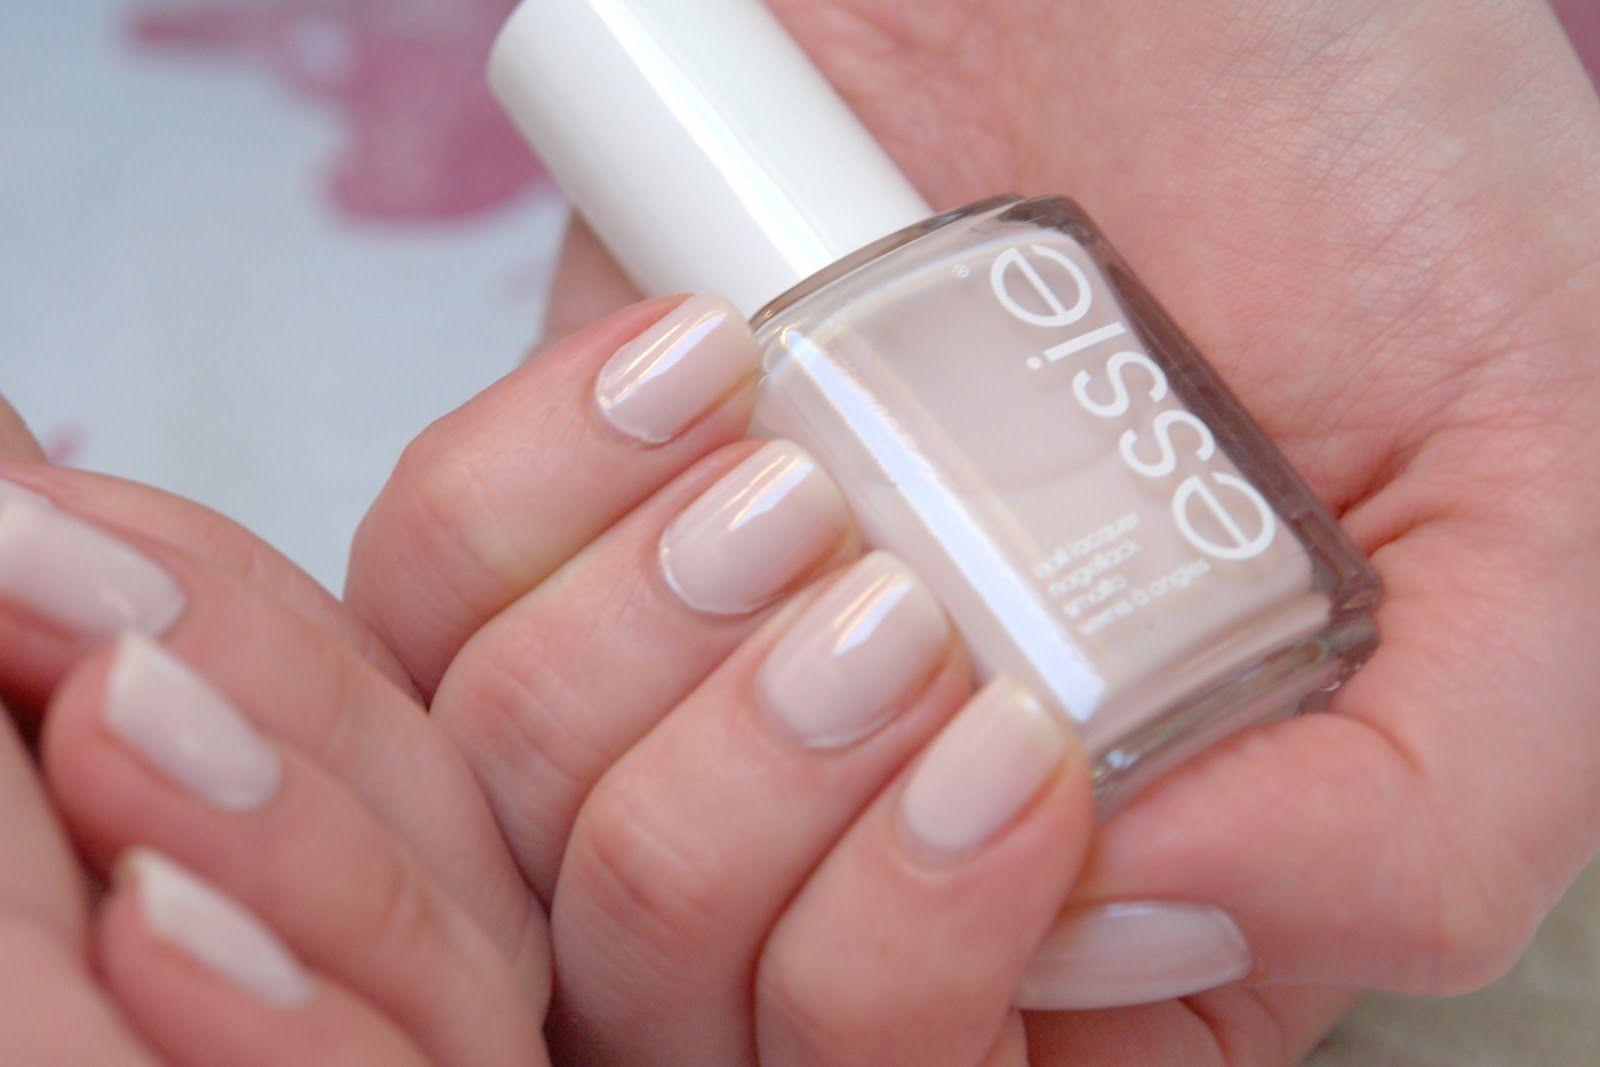 NAILS: Essie ballet slippers, swatches, Essie, nail polish, nails ...